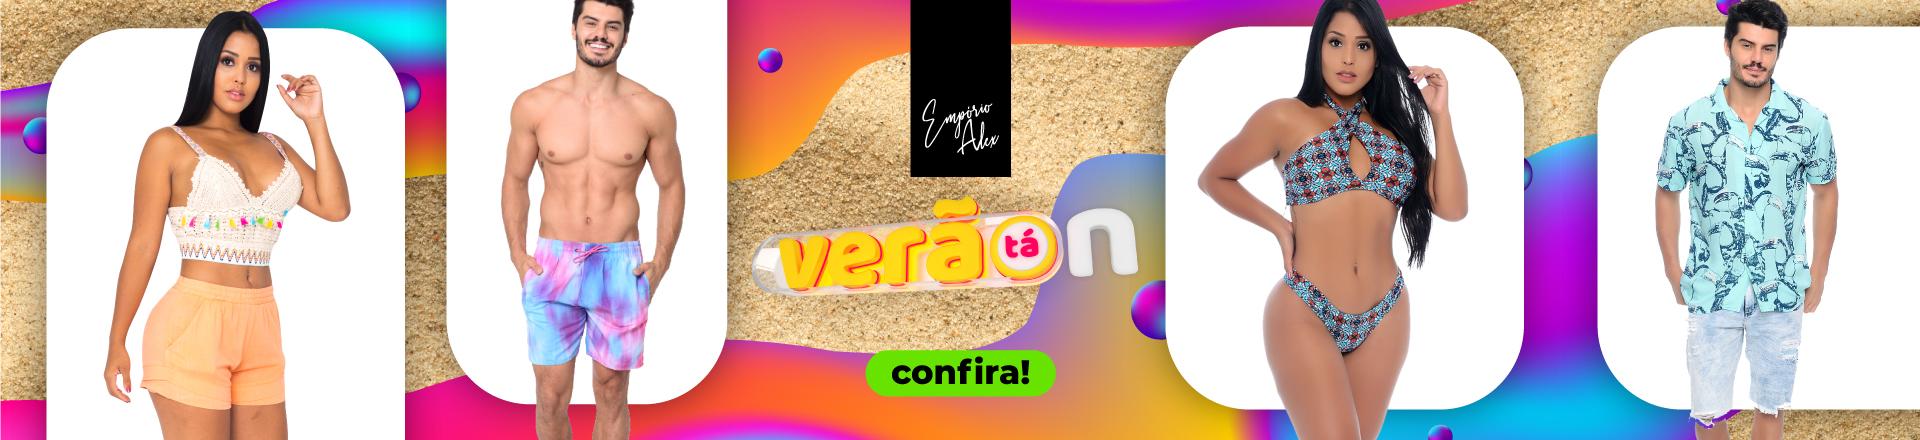 Banner-Verão-Desktop3